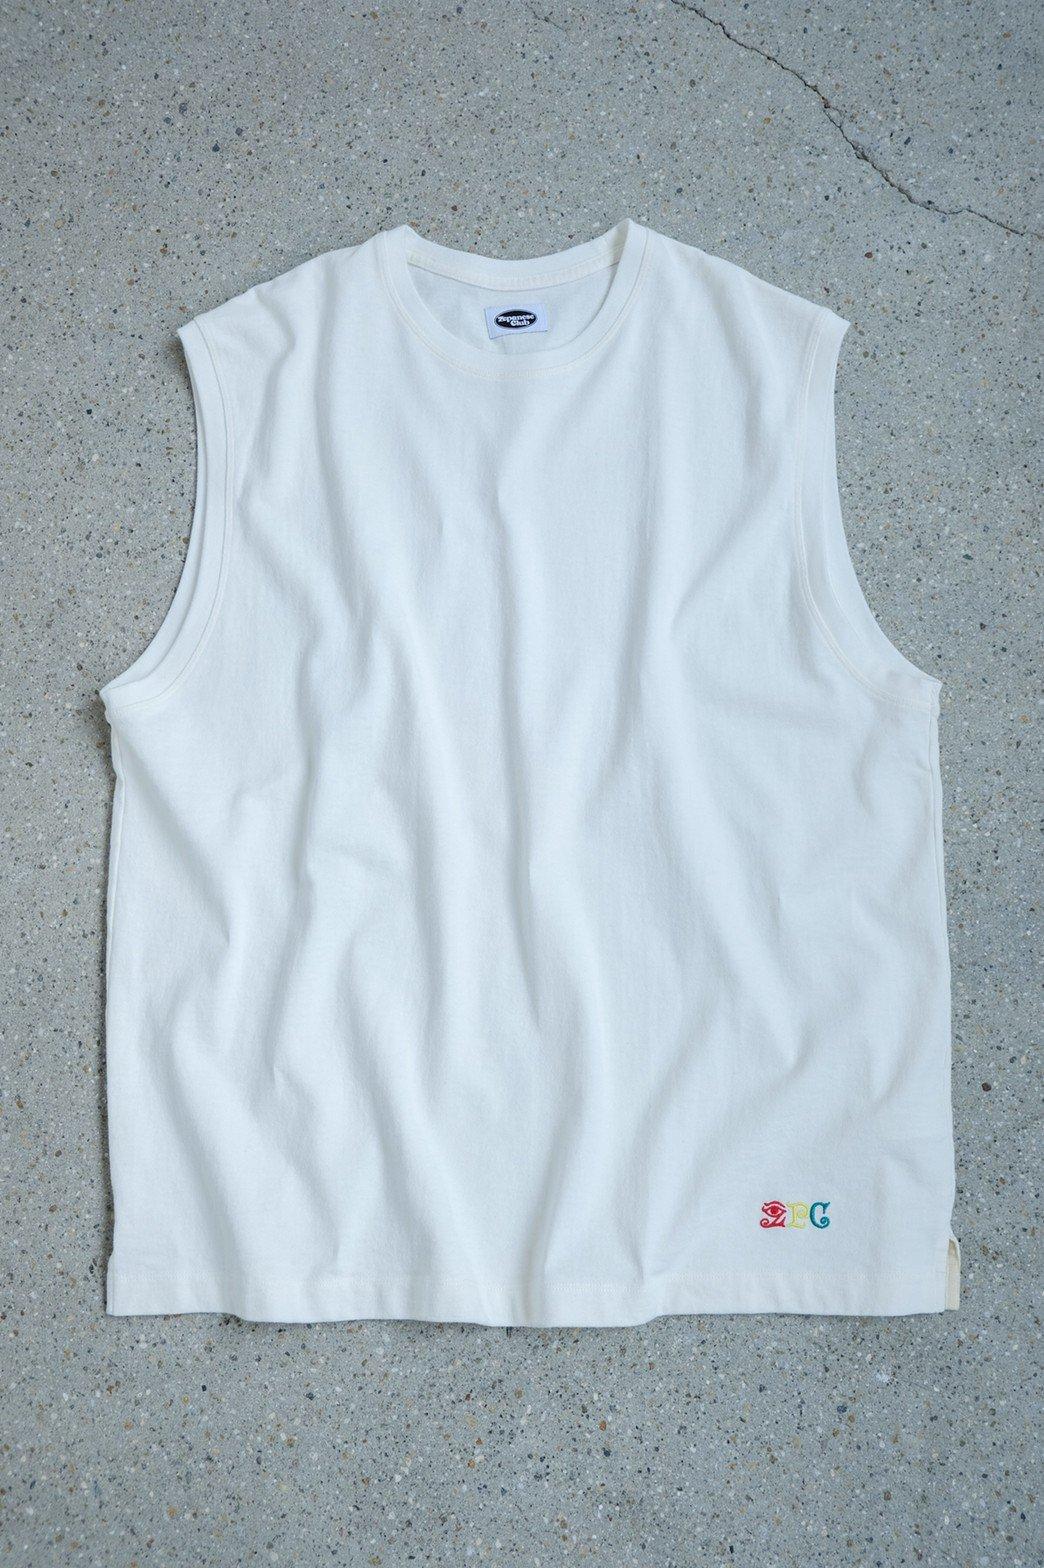 Zepanese Club / 刺繍 NO SLEEVE TEE WHITE